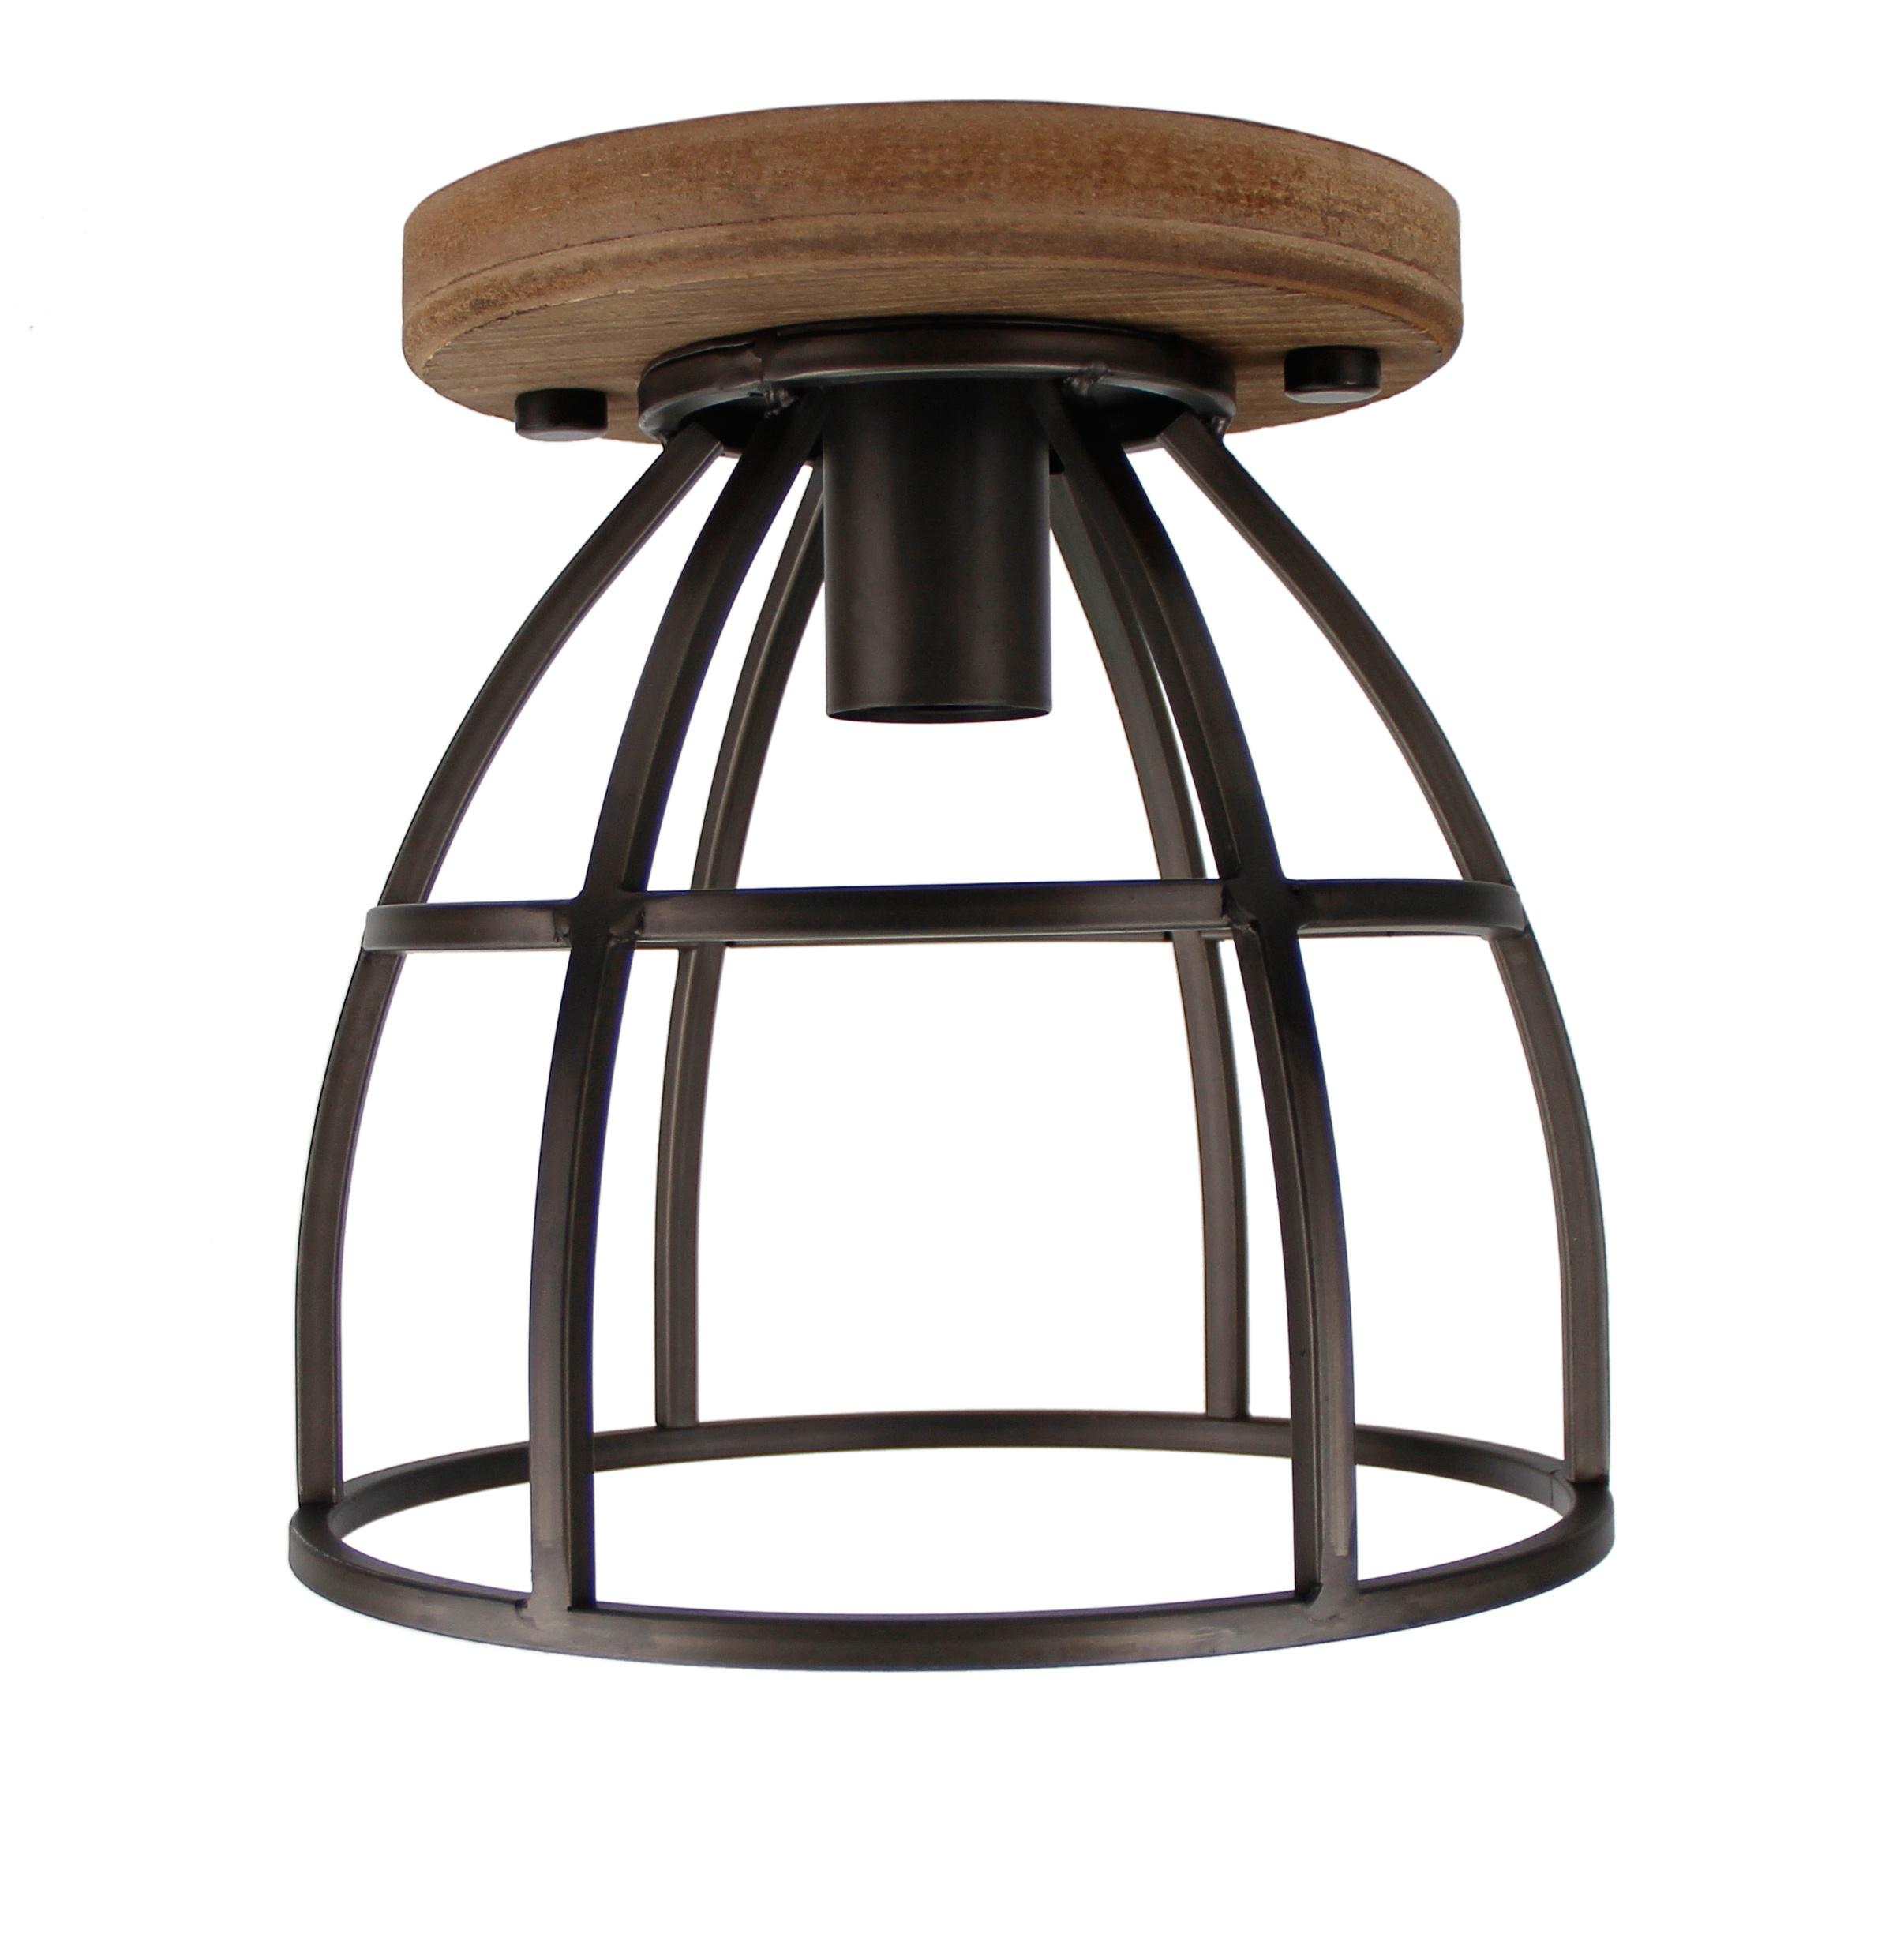 Aperto plafondlamp - 1 lichts - 25 cm - zwart black steel met vintage wood